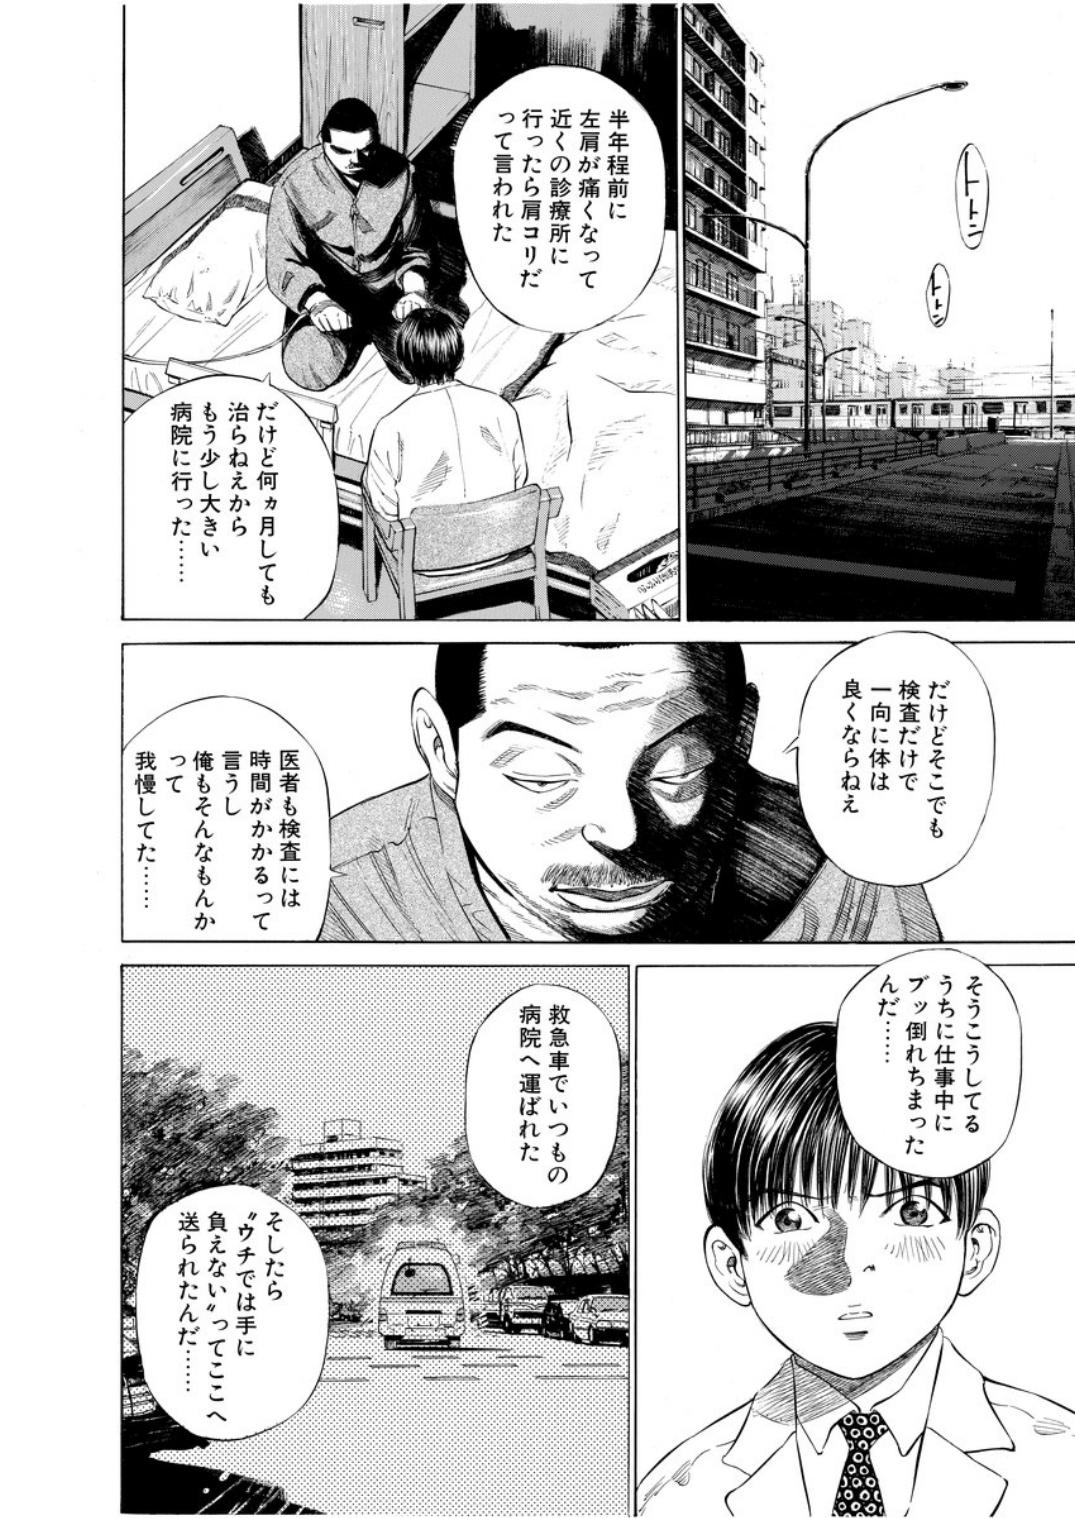 001bj_page-0184.jpg